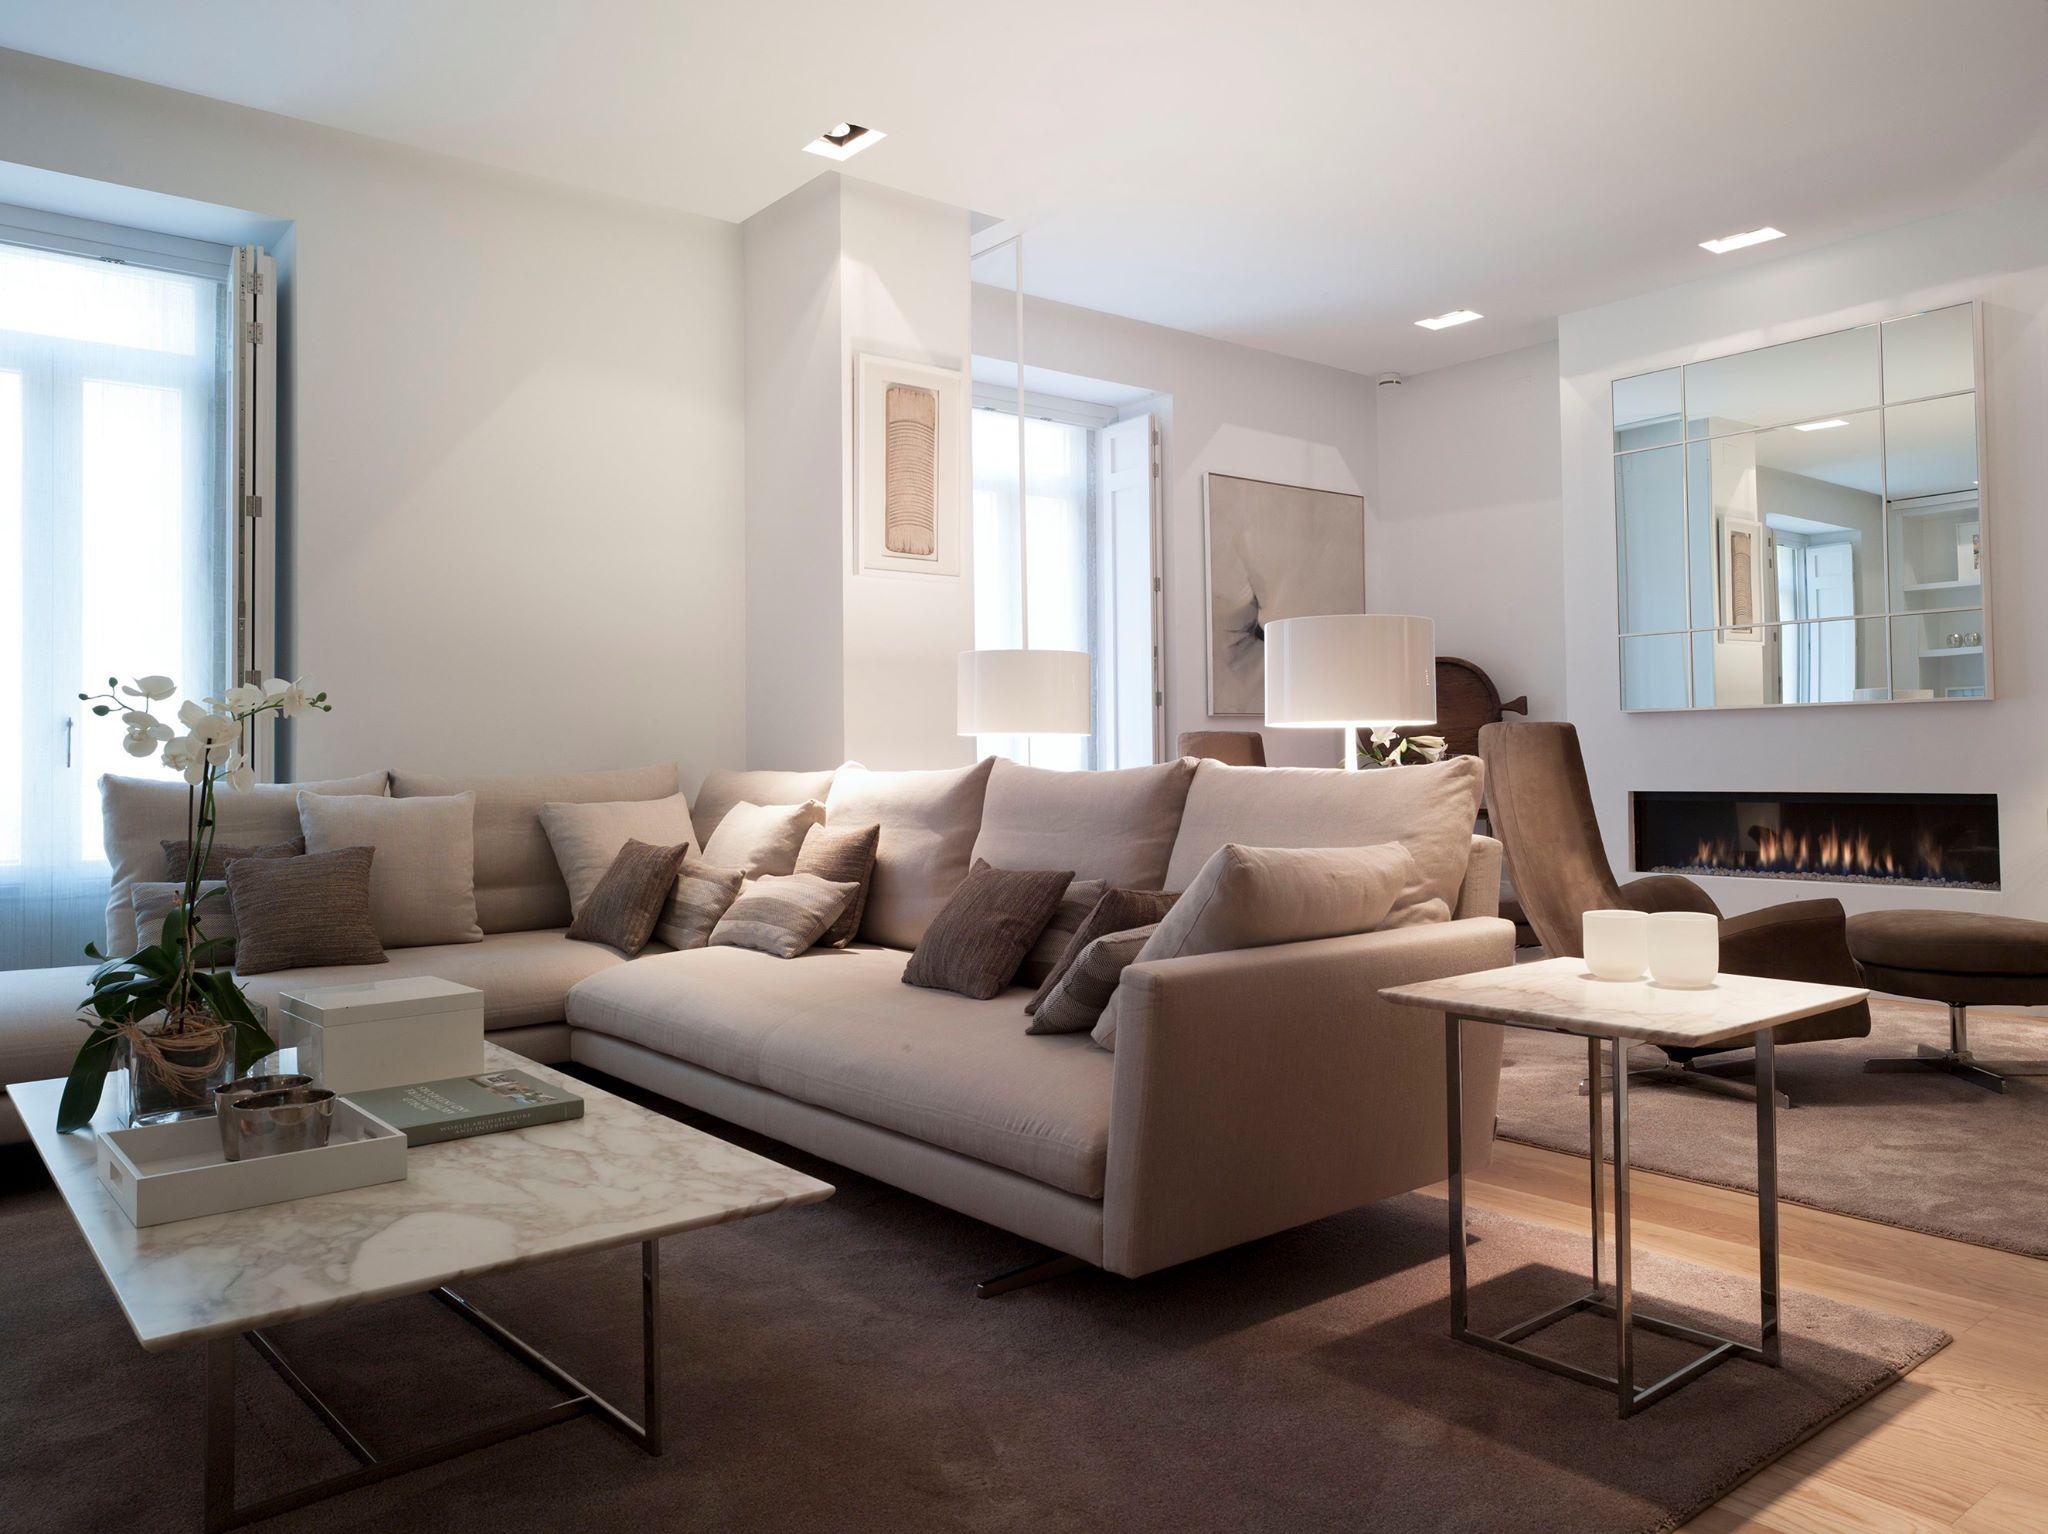 reforma-residencial-Salon